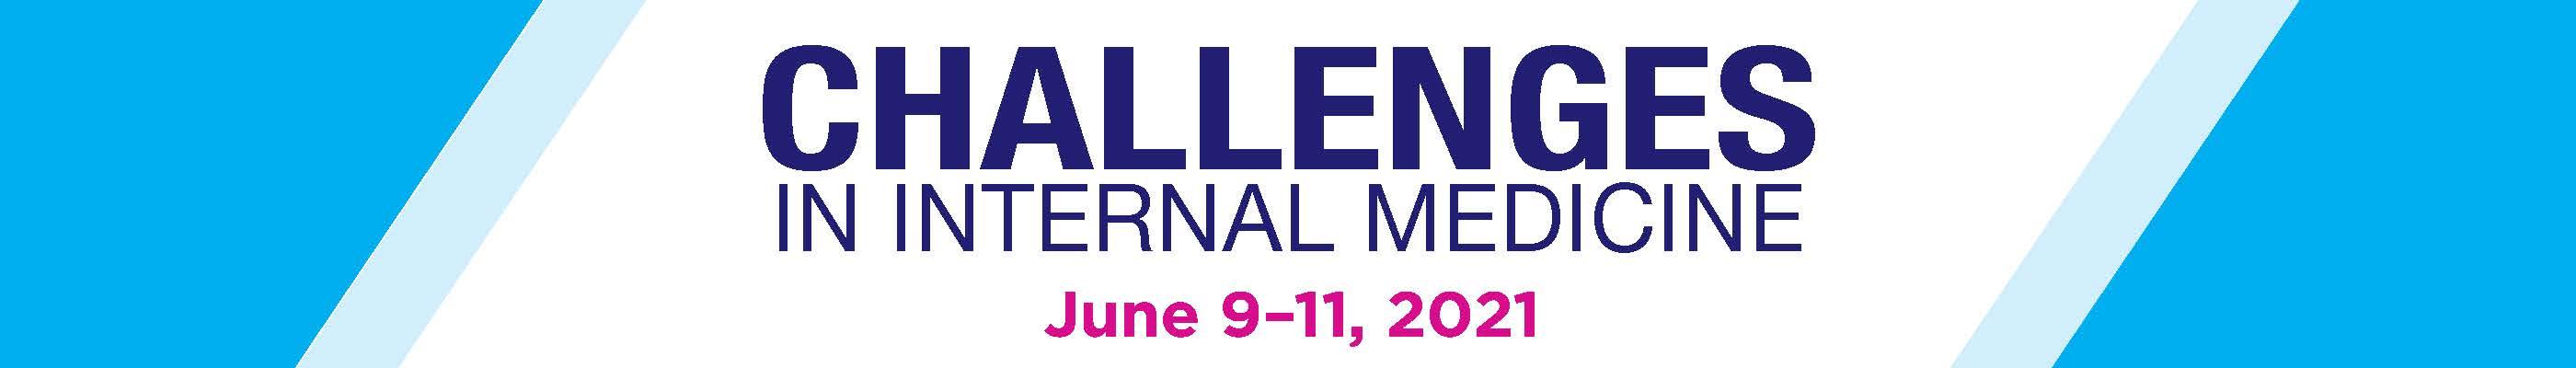 Virtual-Challenges in Internal Medicine Banner